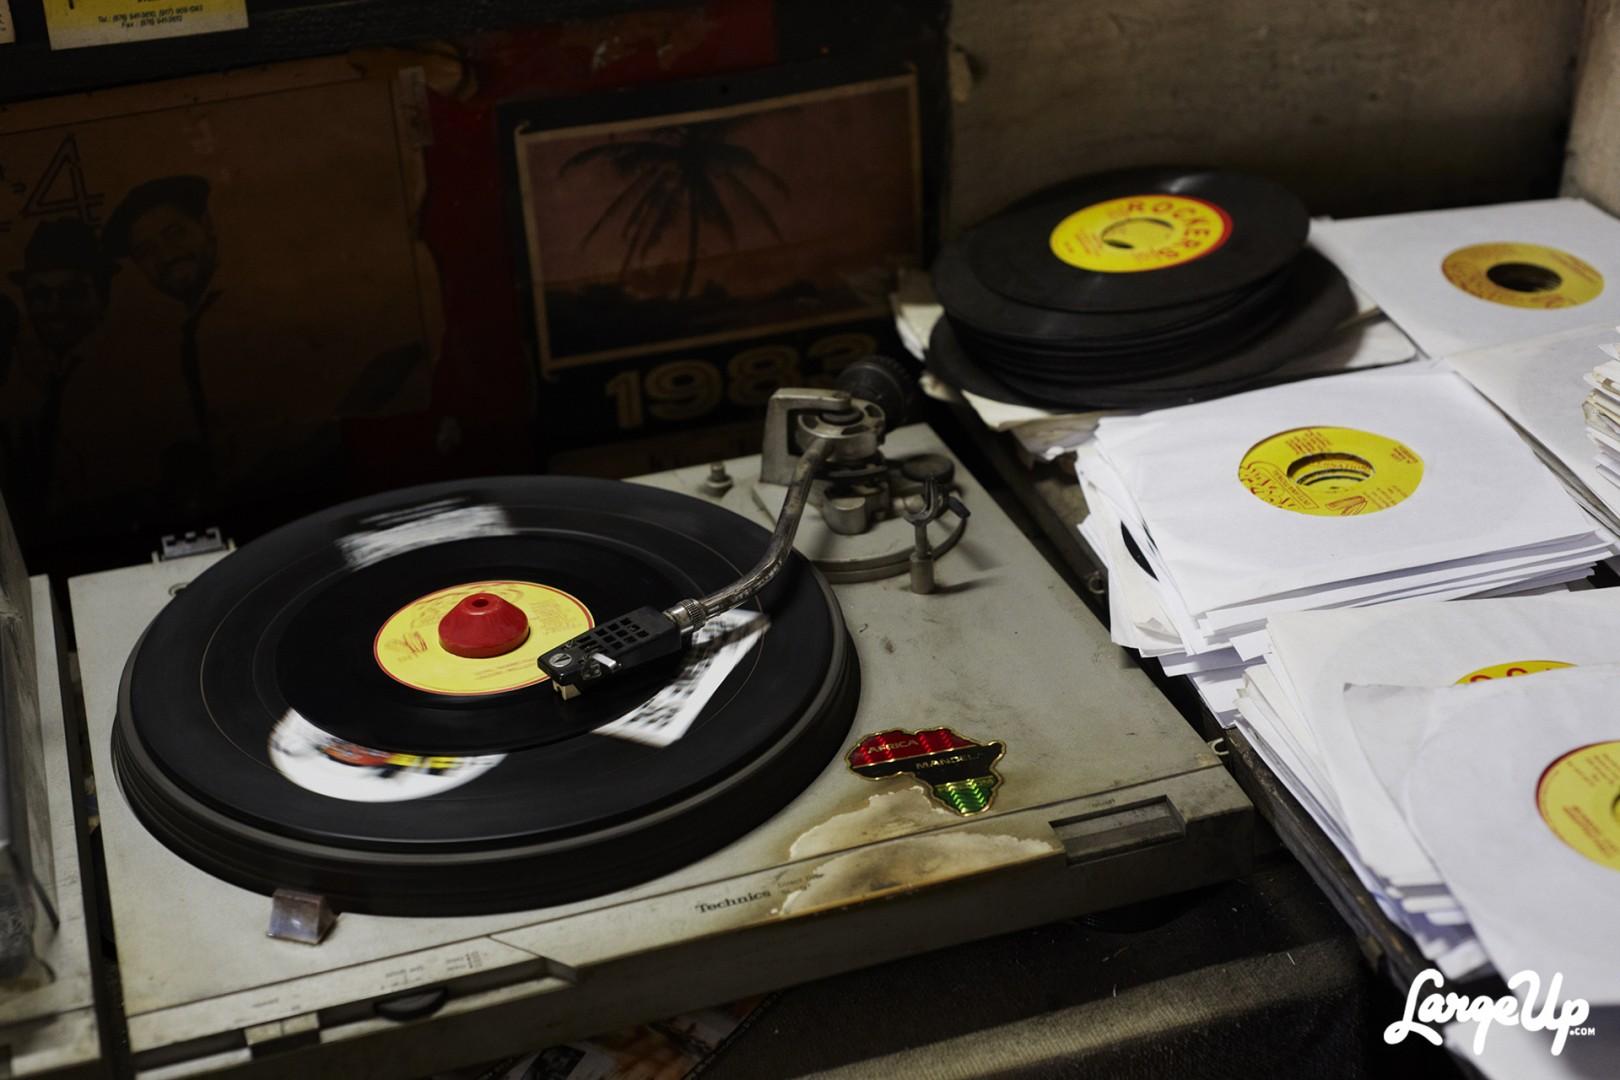 Rockers-International-Record-Store-4-1620x1080.jpg